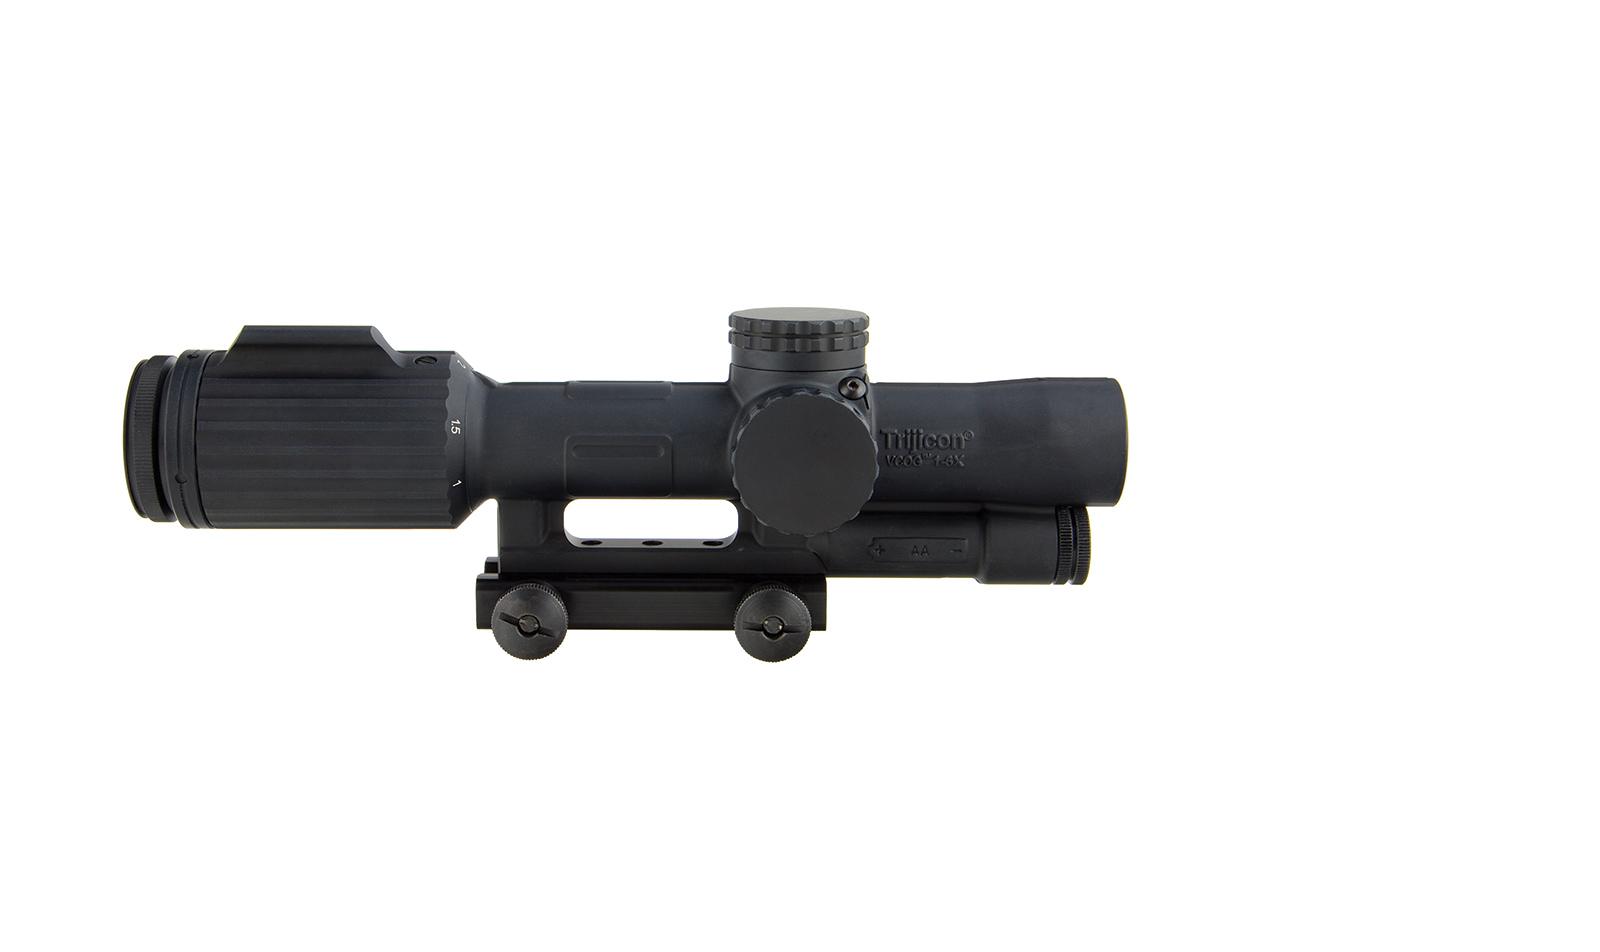 VC16-C-1600041 angle 6